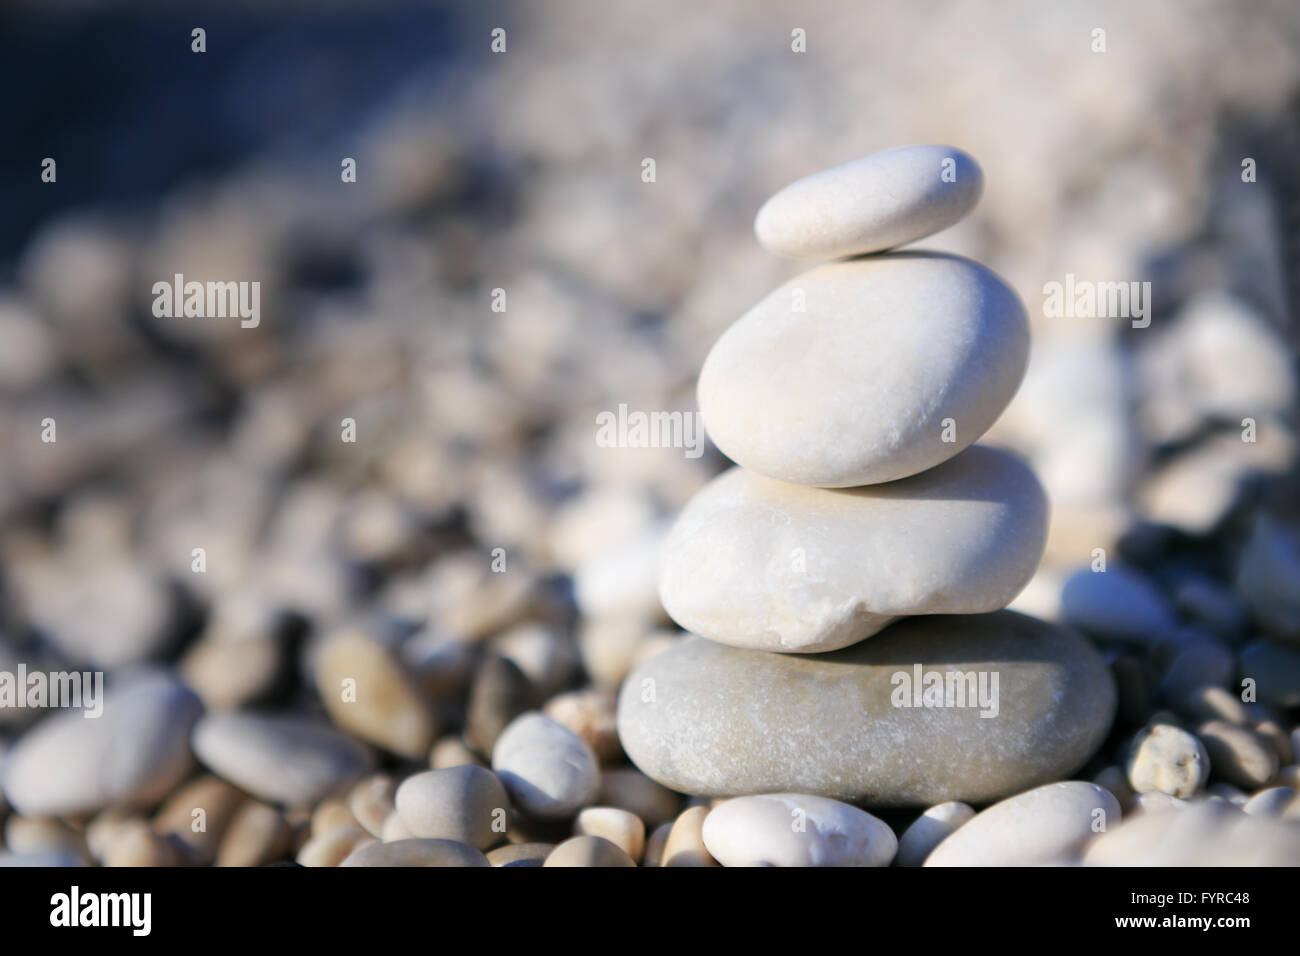 Zen and balance concept – pebble stones - Stock Image